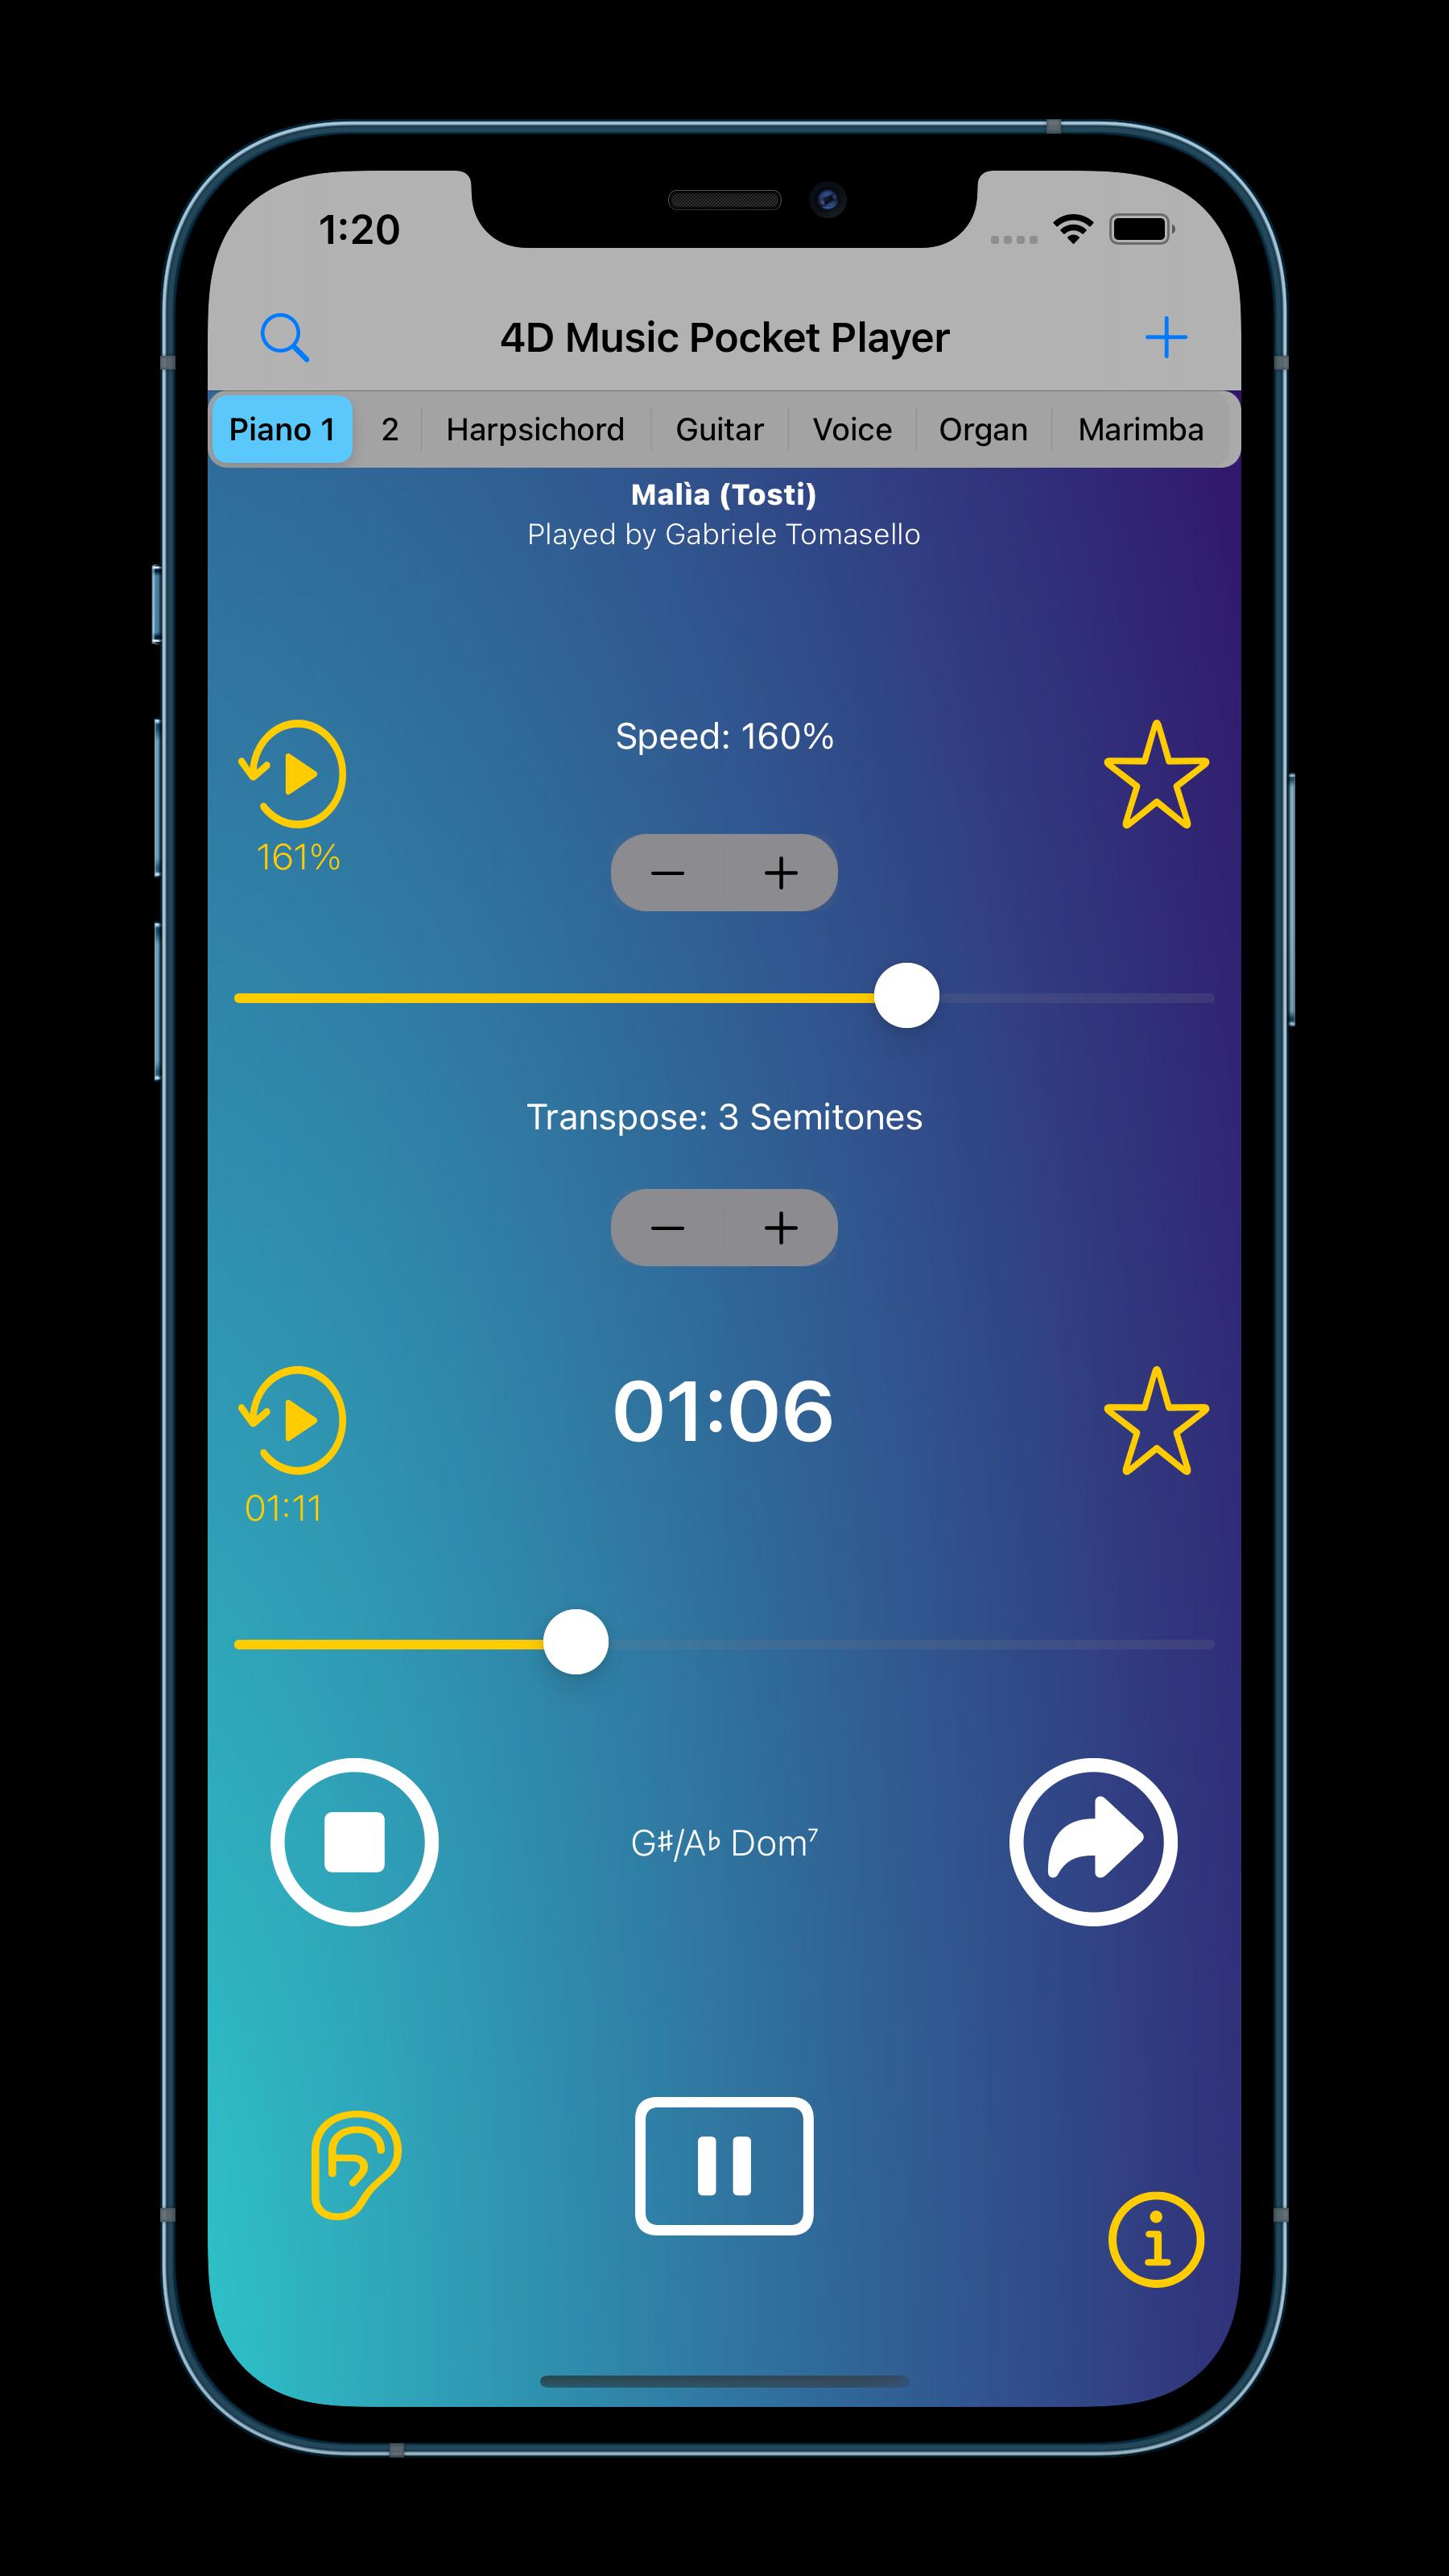 4D Music Pocket Player